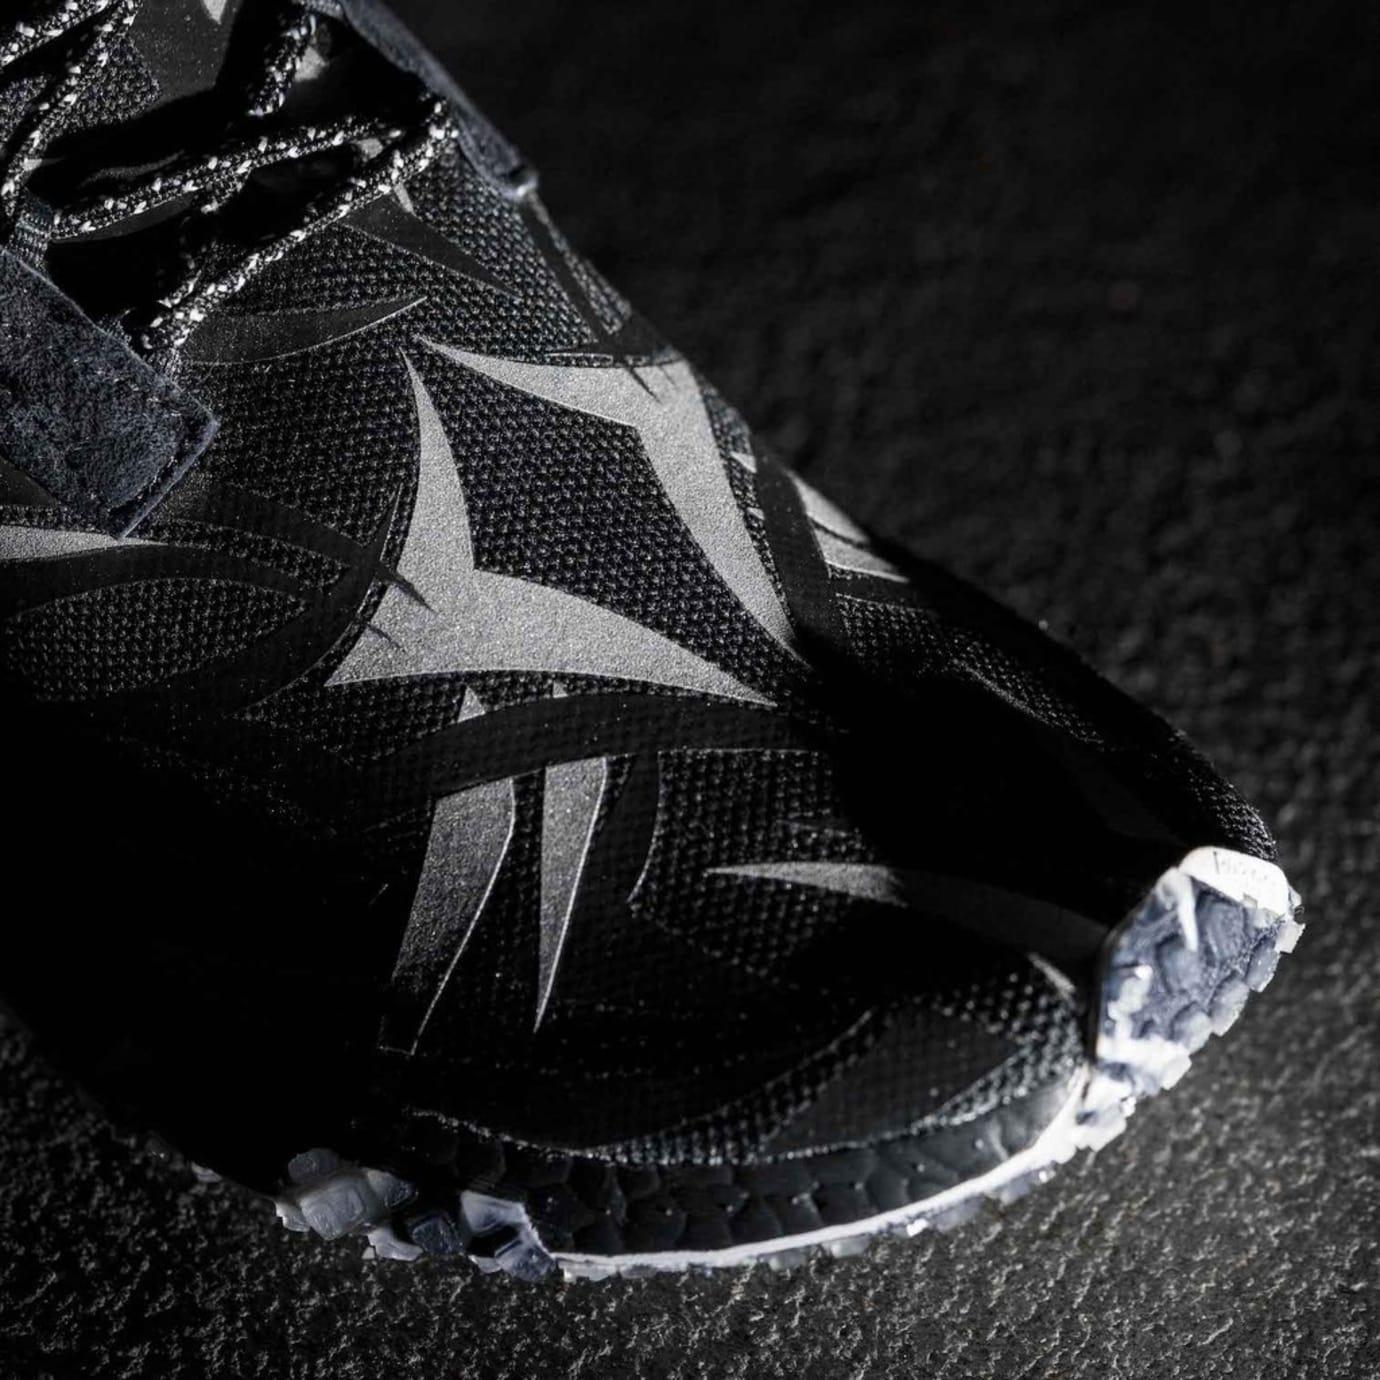 brand new 57ba8 b2396 Juice x Adidas Consortium NMD Racer Core Black/White DB1777 ...